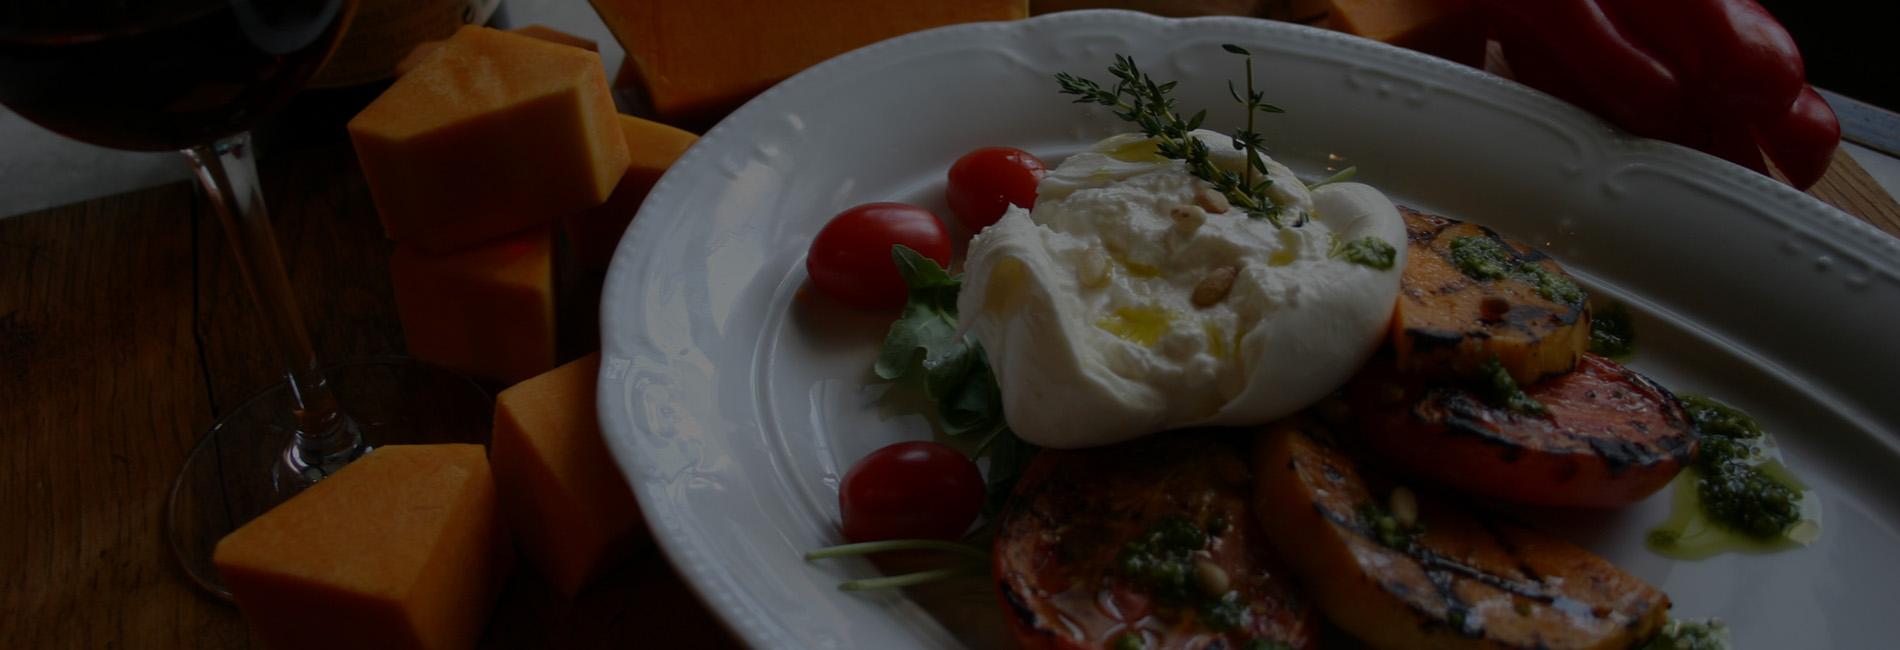 Medi Wine Bar - Mediterrean Food